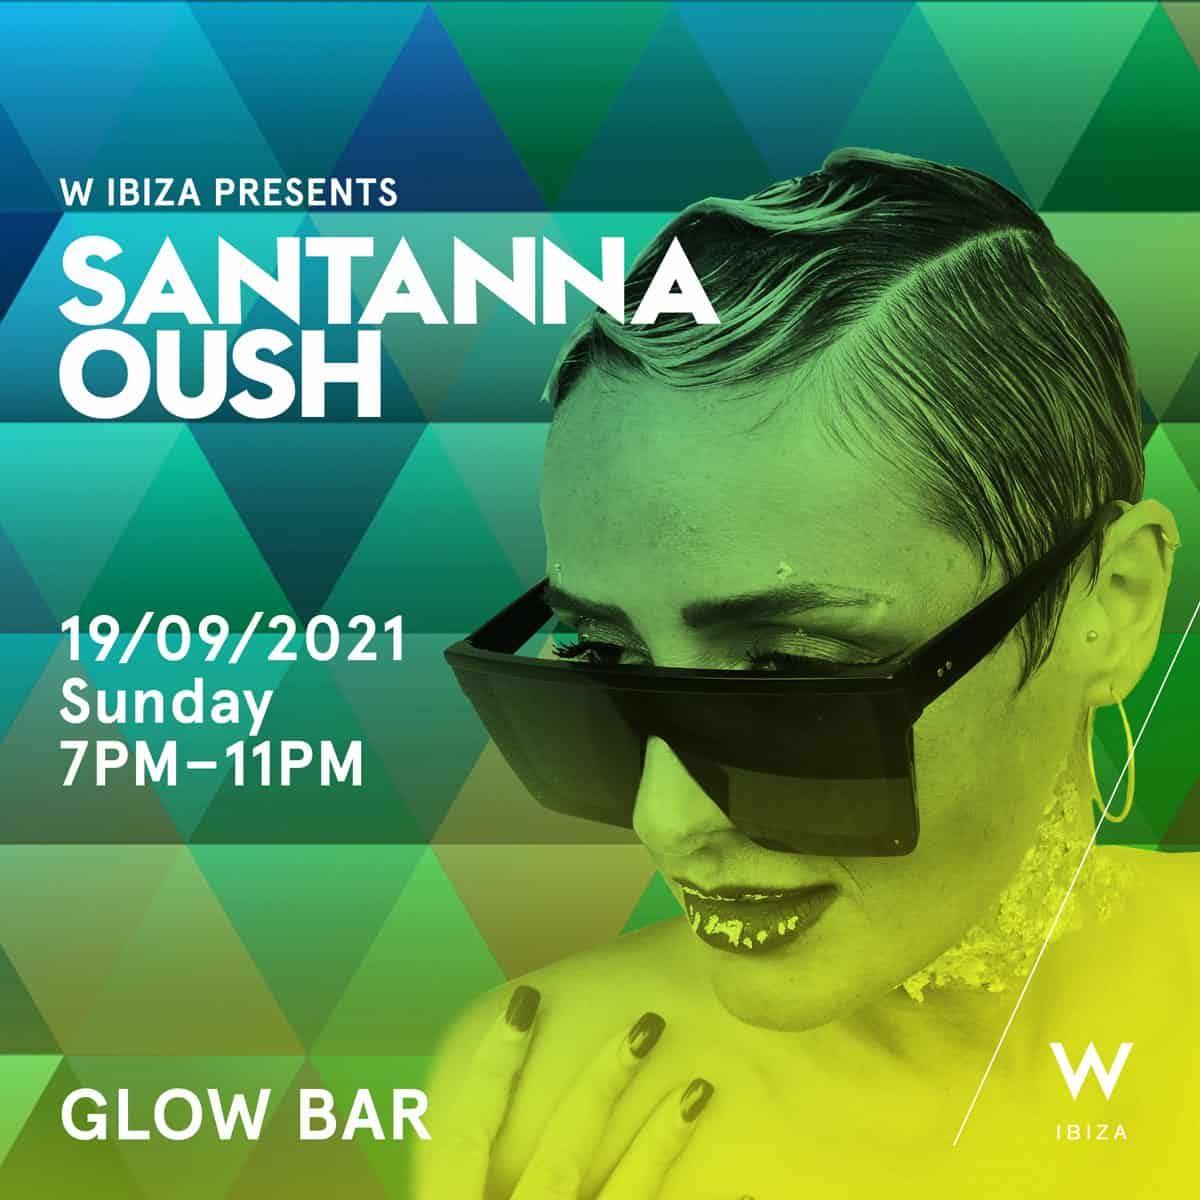 santanna-oush-w-ibiza-hotel-2021-welcometoibiza